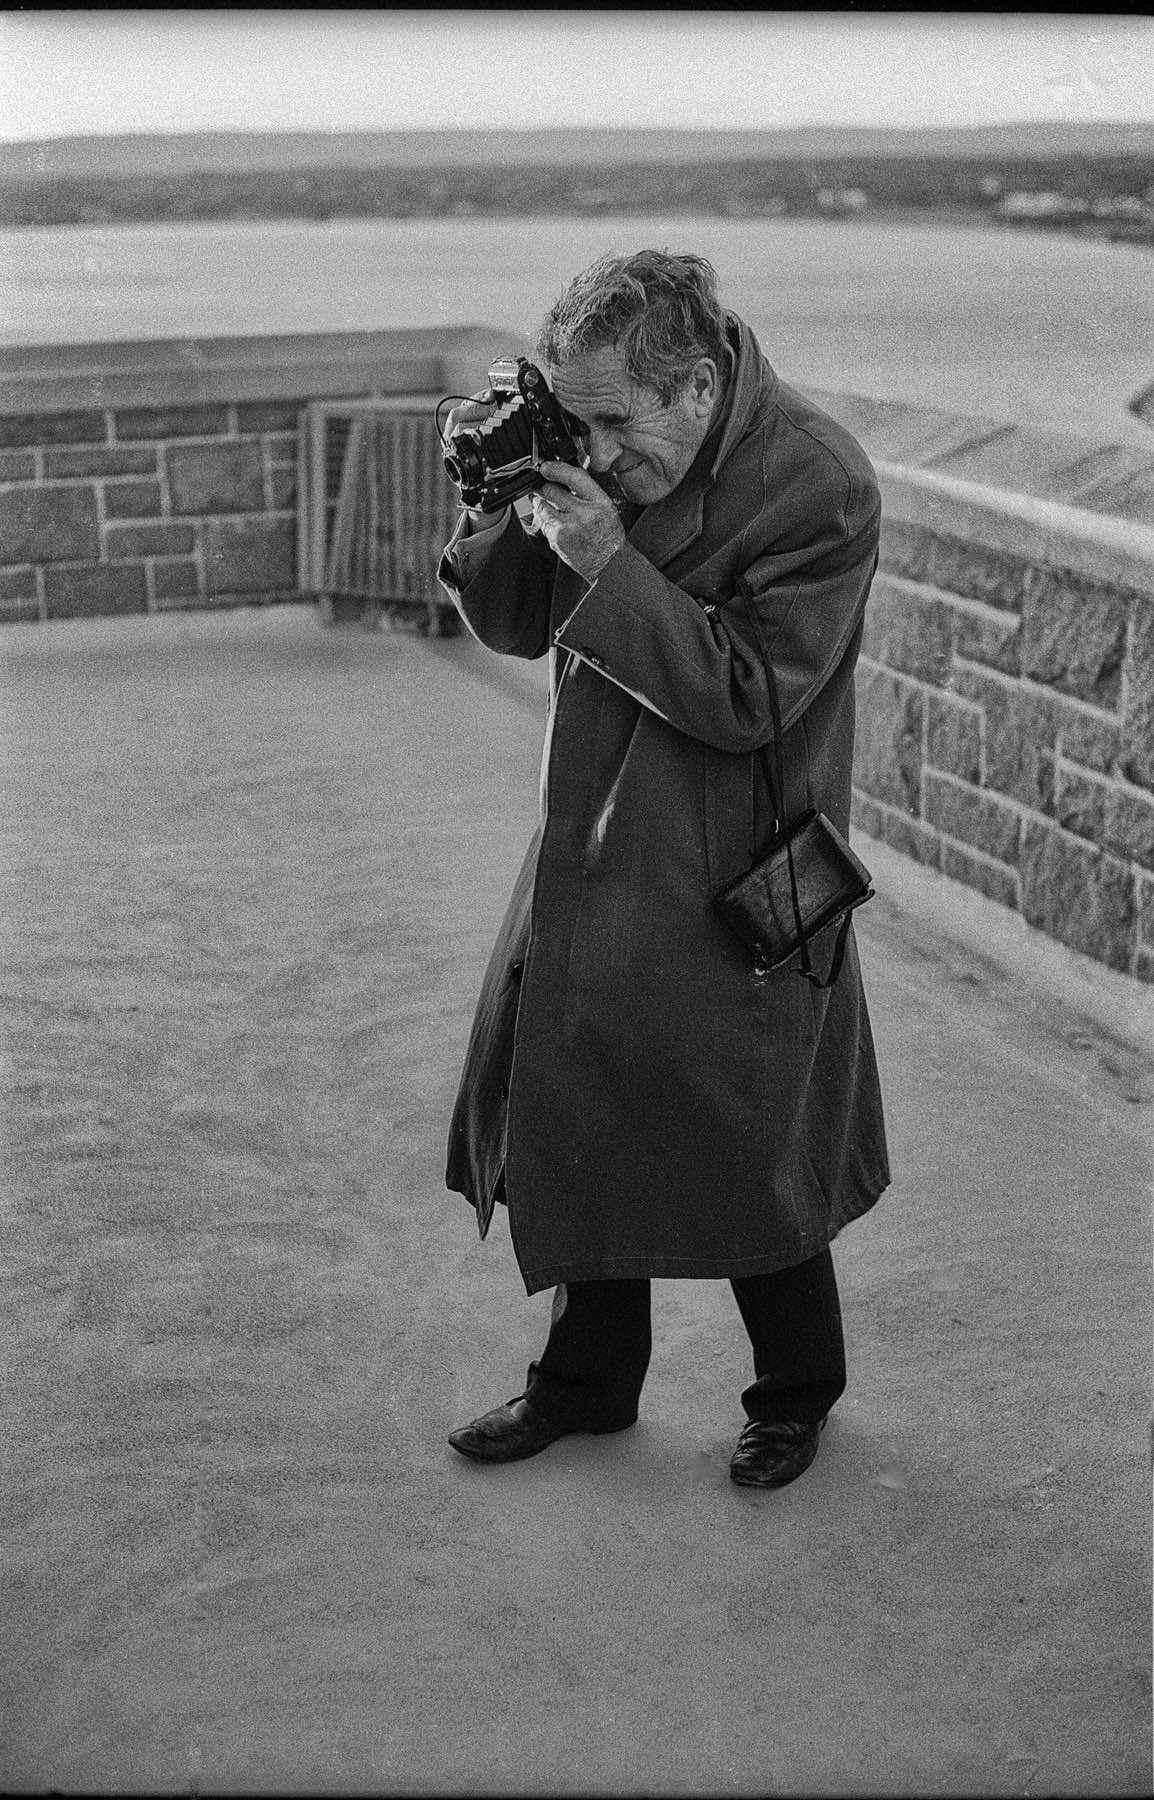 1977 PERTH ANZAC DAY PHOTOGRAPHER (1)